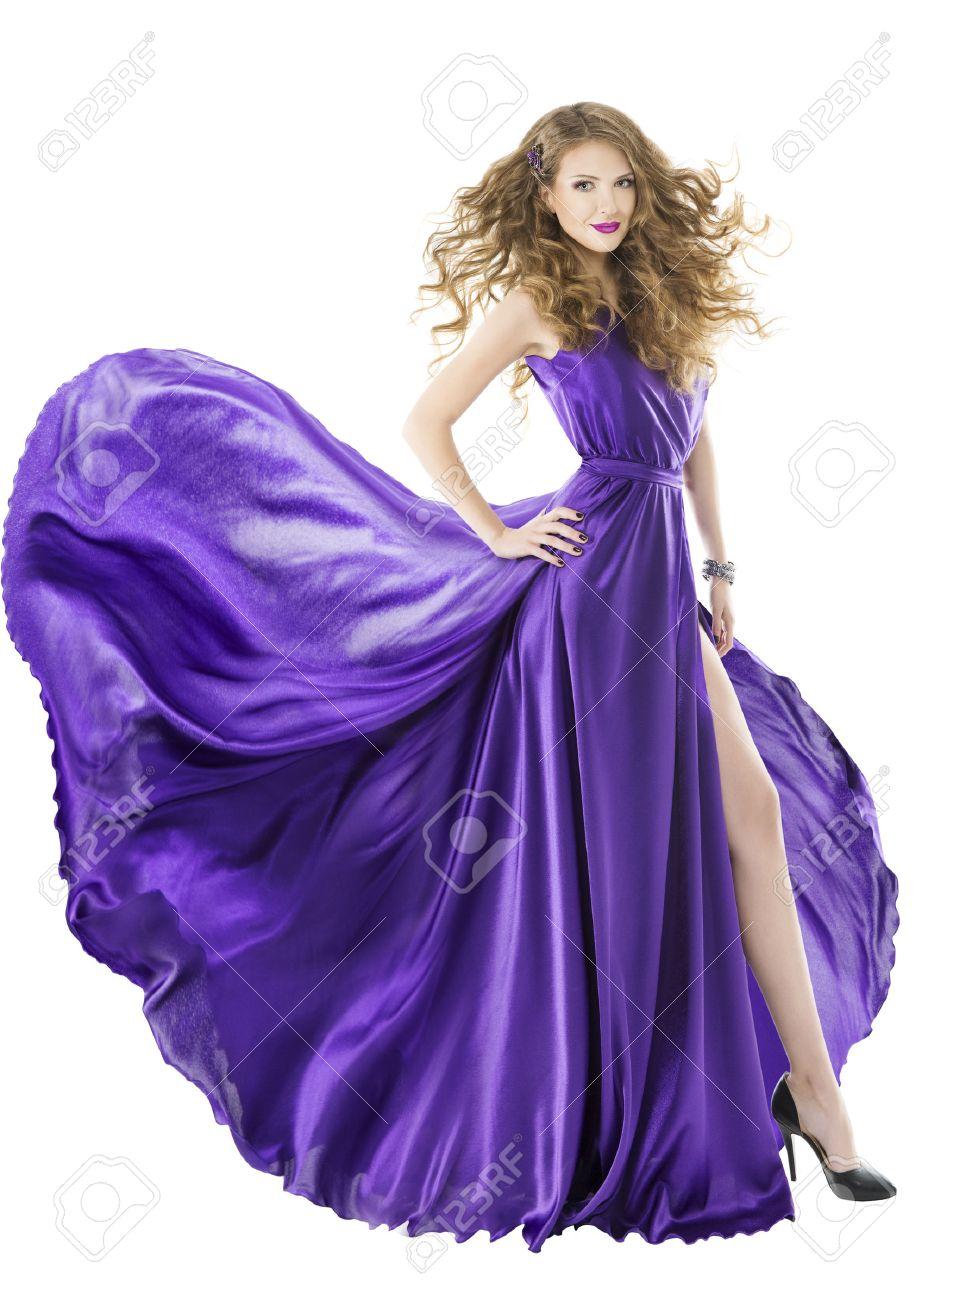 Vestido De Mujer De Seda, Tren Aleteo Largo, Muchacha Púrpura Ropa ...